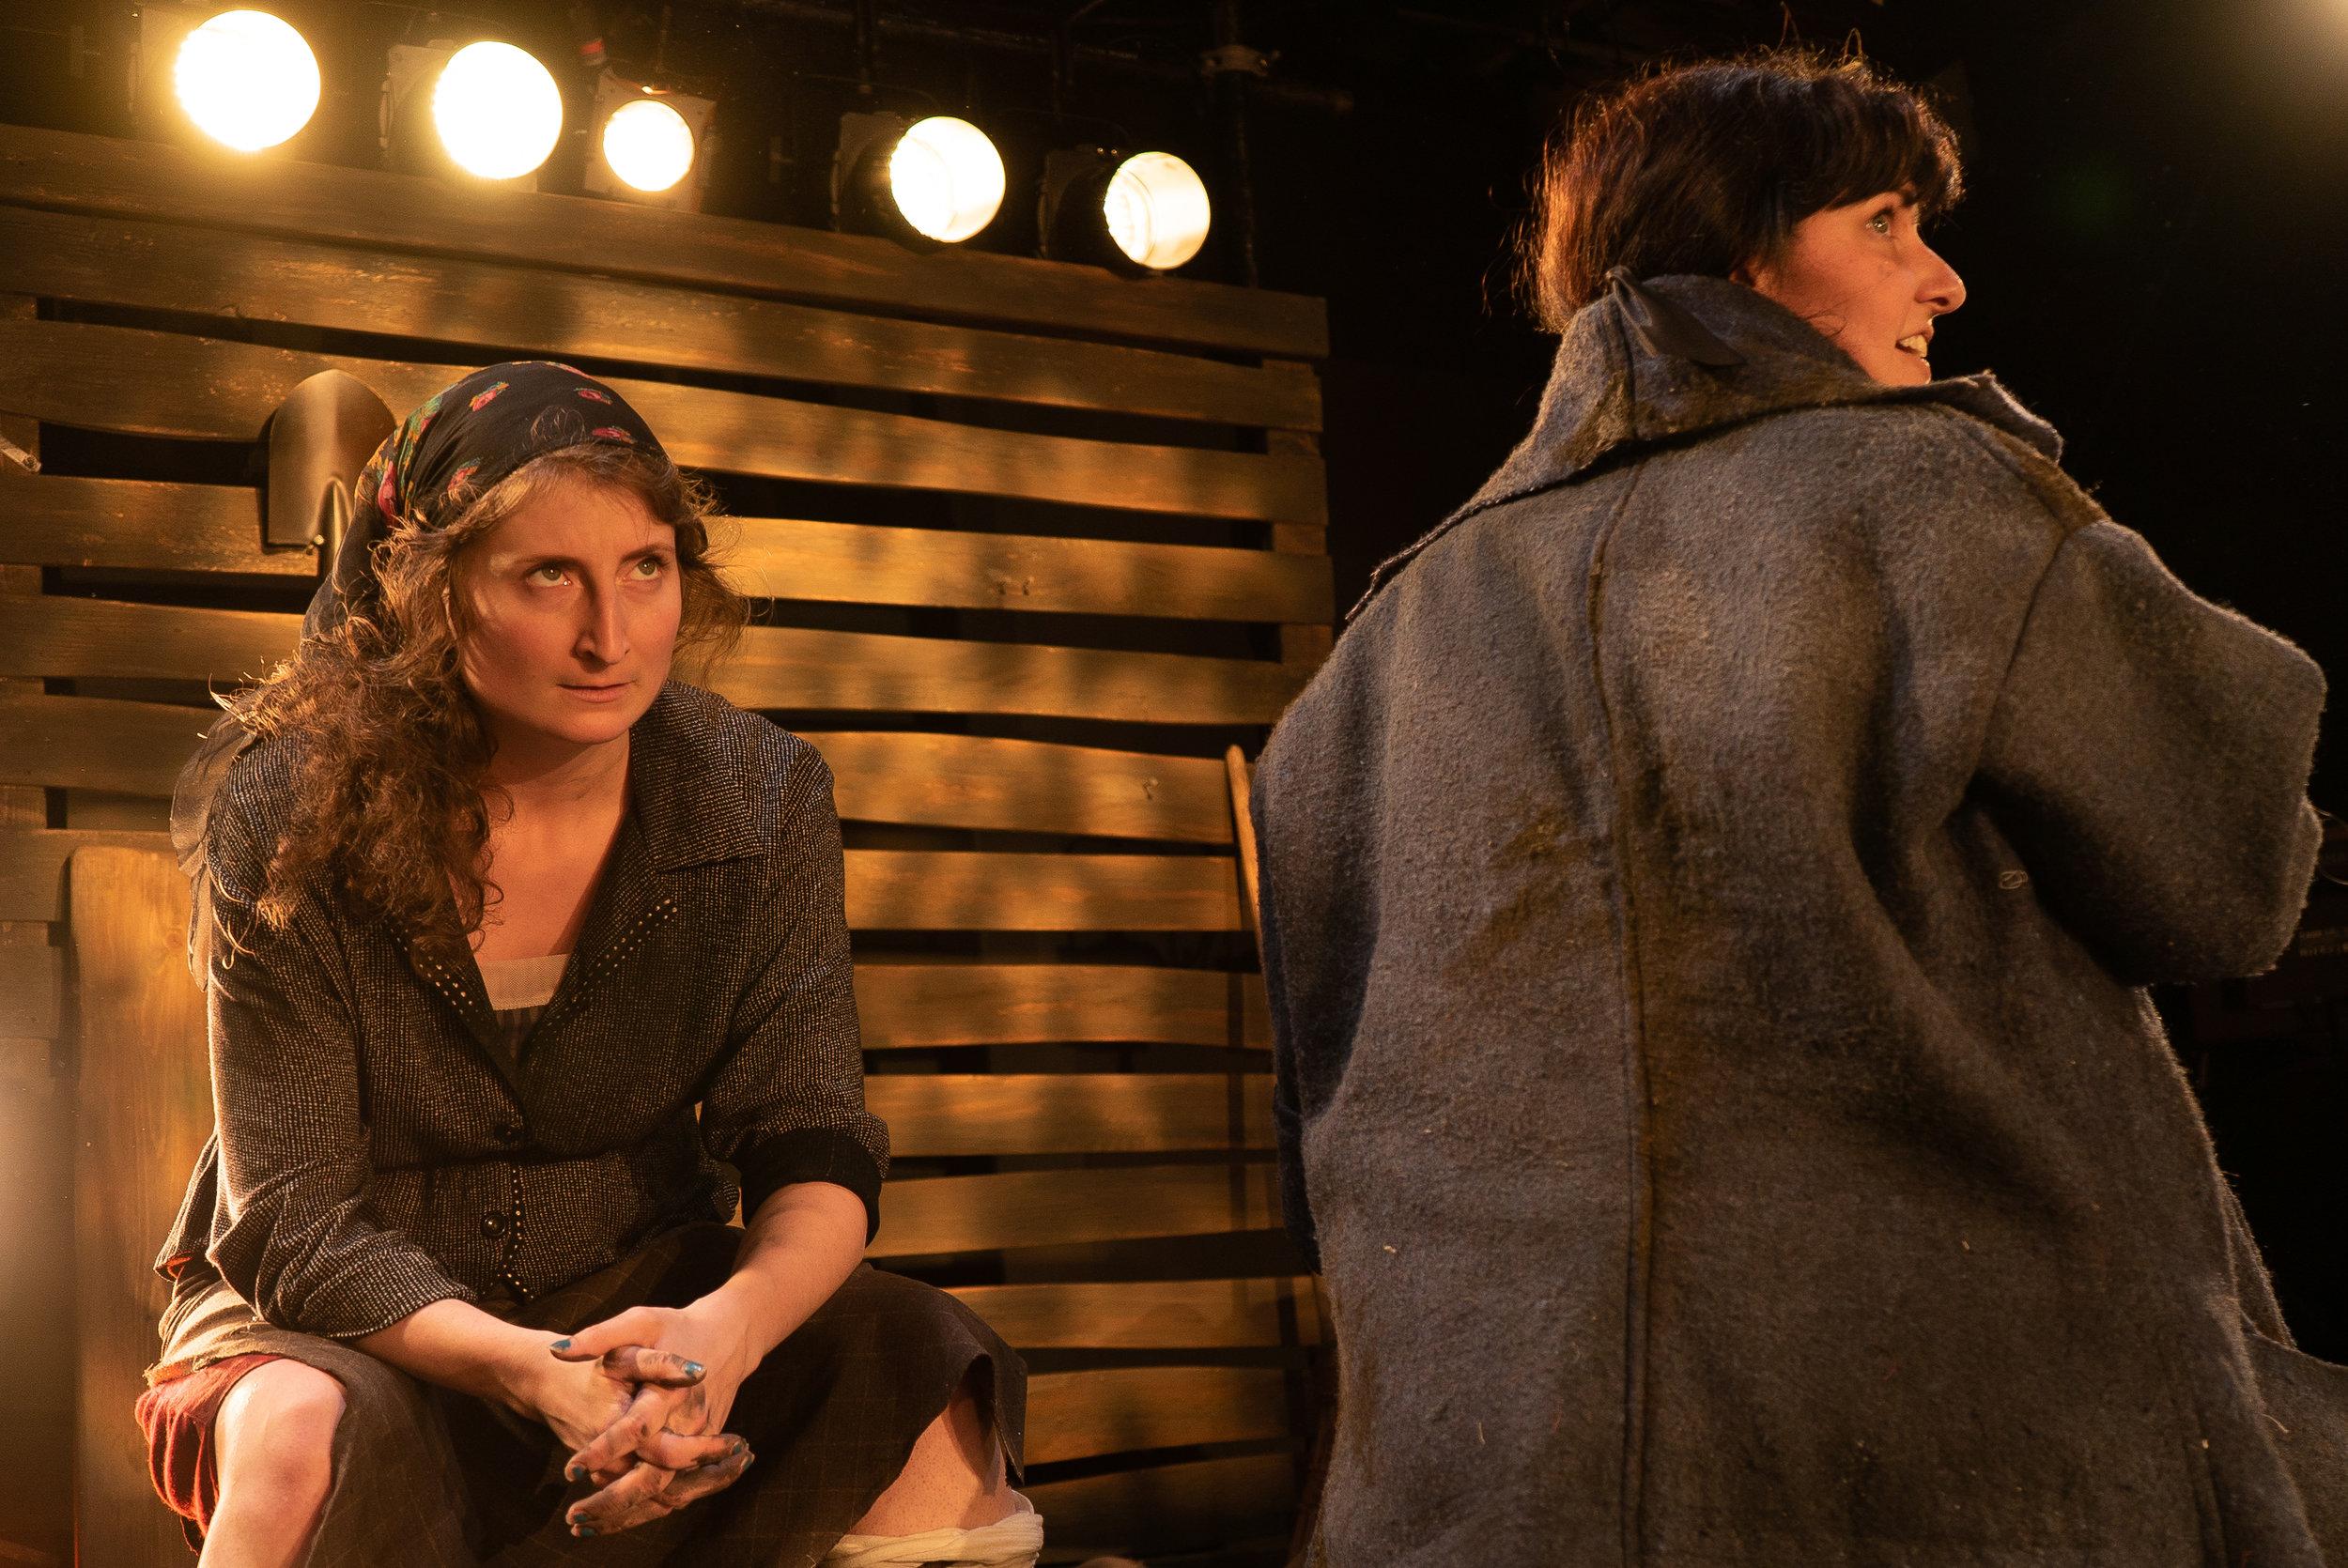 Catherine Dvorak as Halka; Brittany Ellis as Yasia